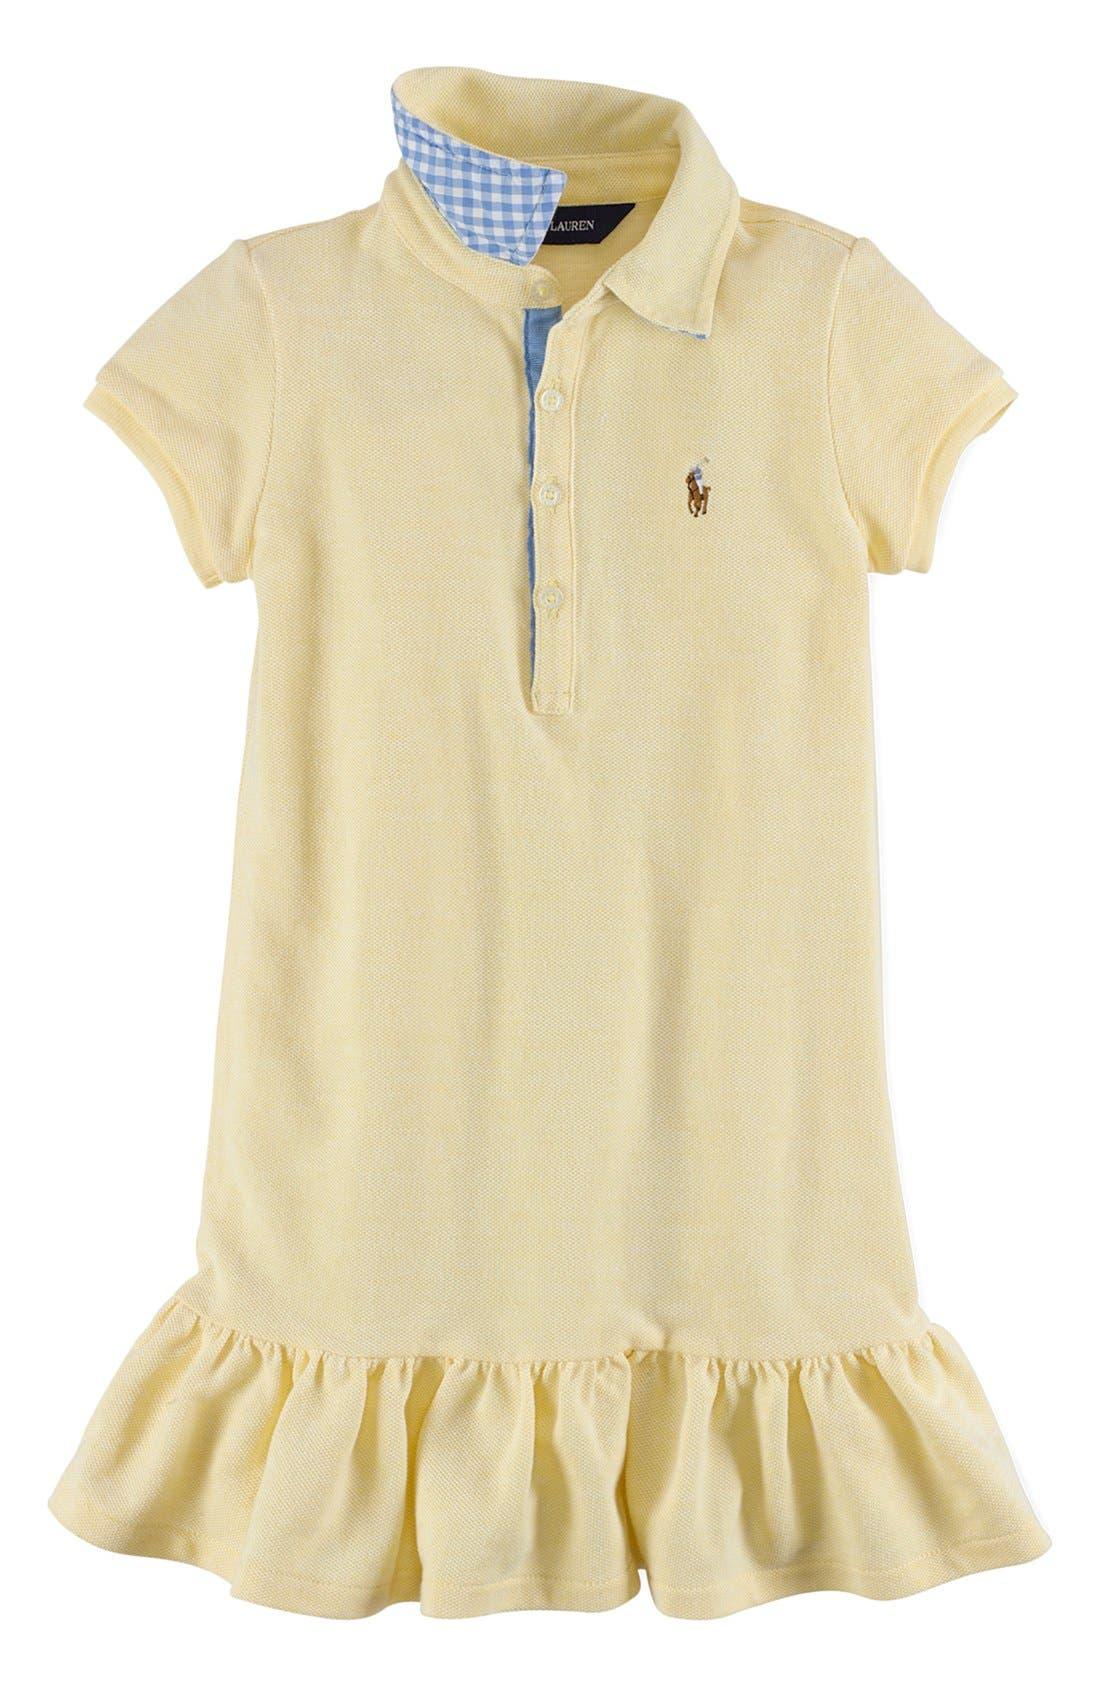 Main Image - Ralph Lauren Polo Dress (Toddler Girls)